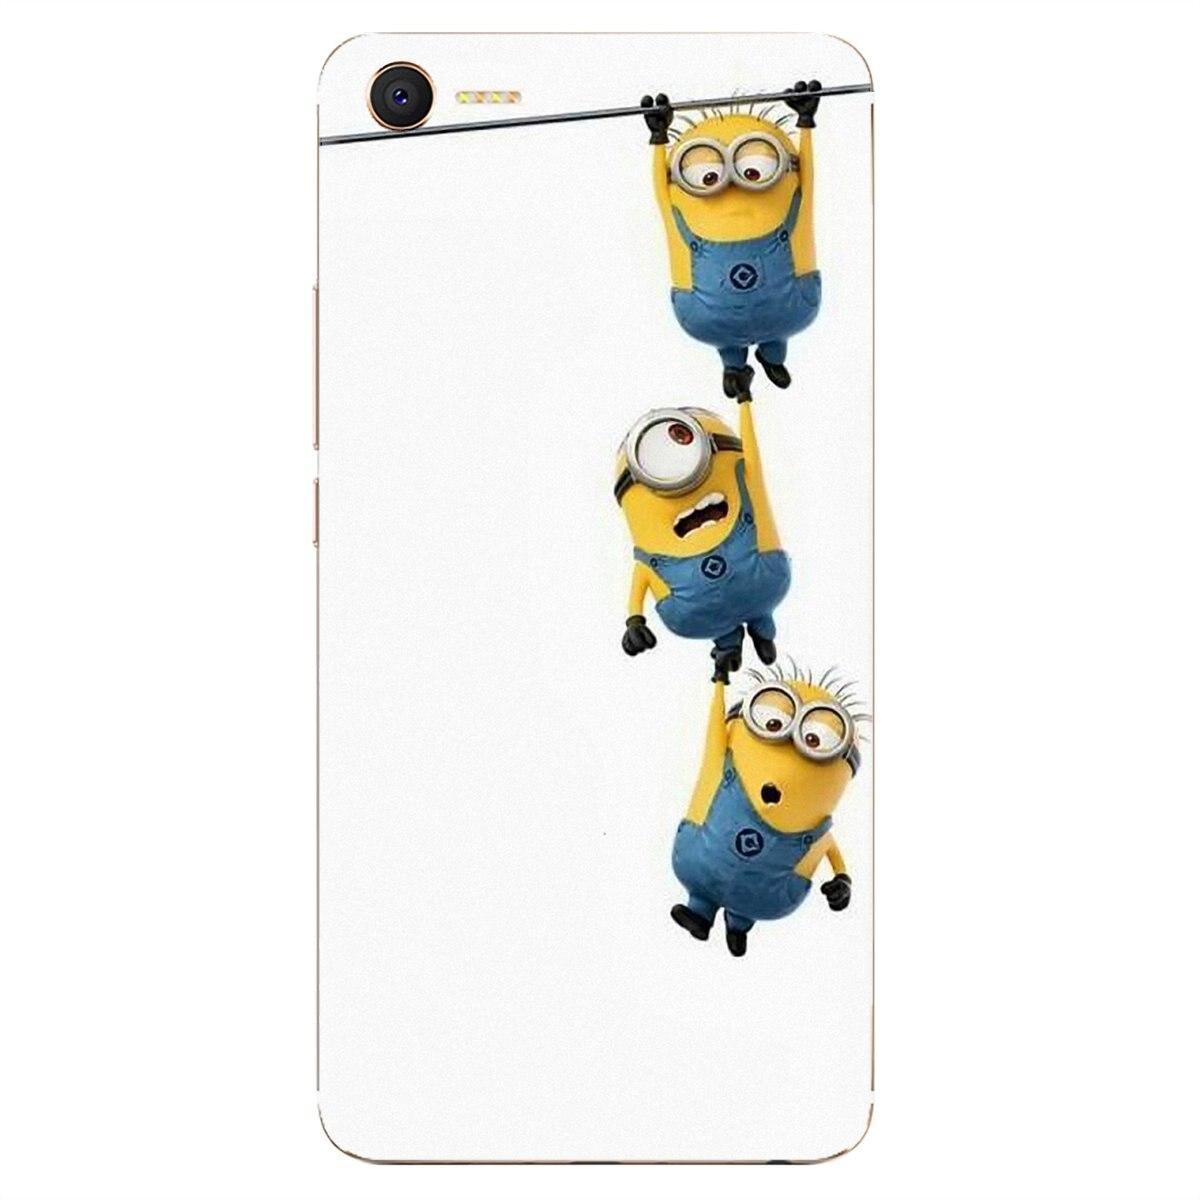 Fundas blandas para Huawei G7 G8 P7 P8 P9 P10 P20 P30 Lite Mini Pro P Smart 2017 2018 2019 dibujos animados Despicable Me amarillo Minions